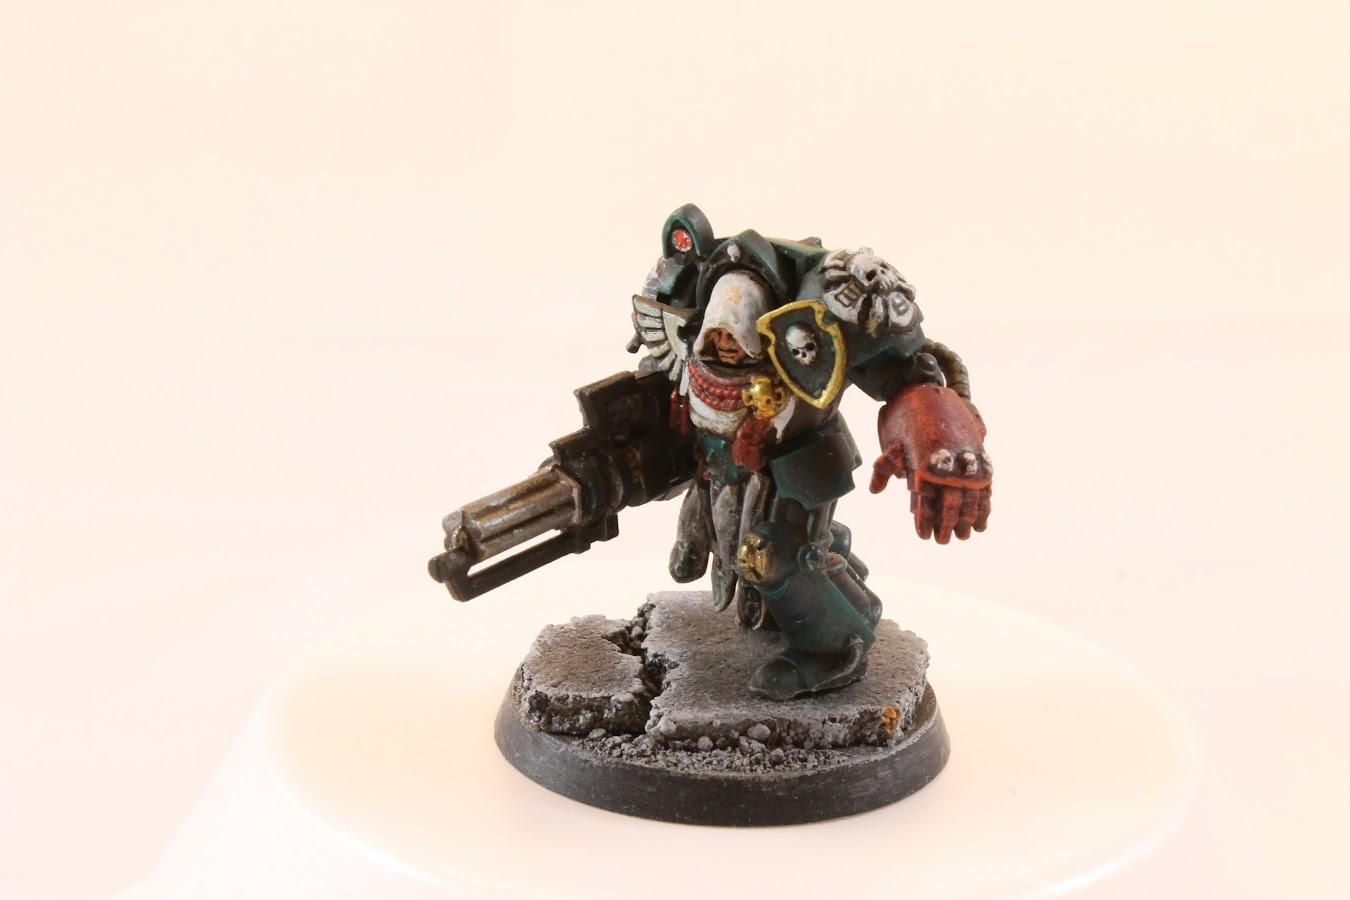 Terminator #1, painted